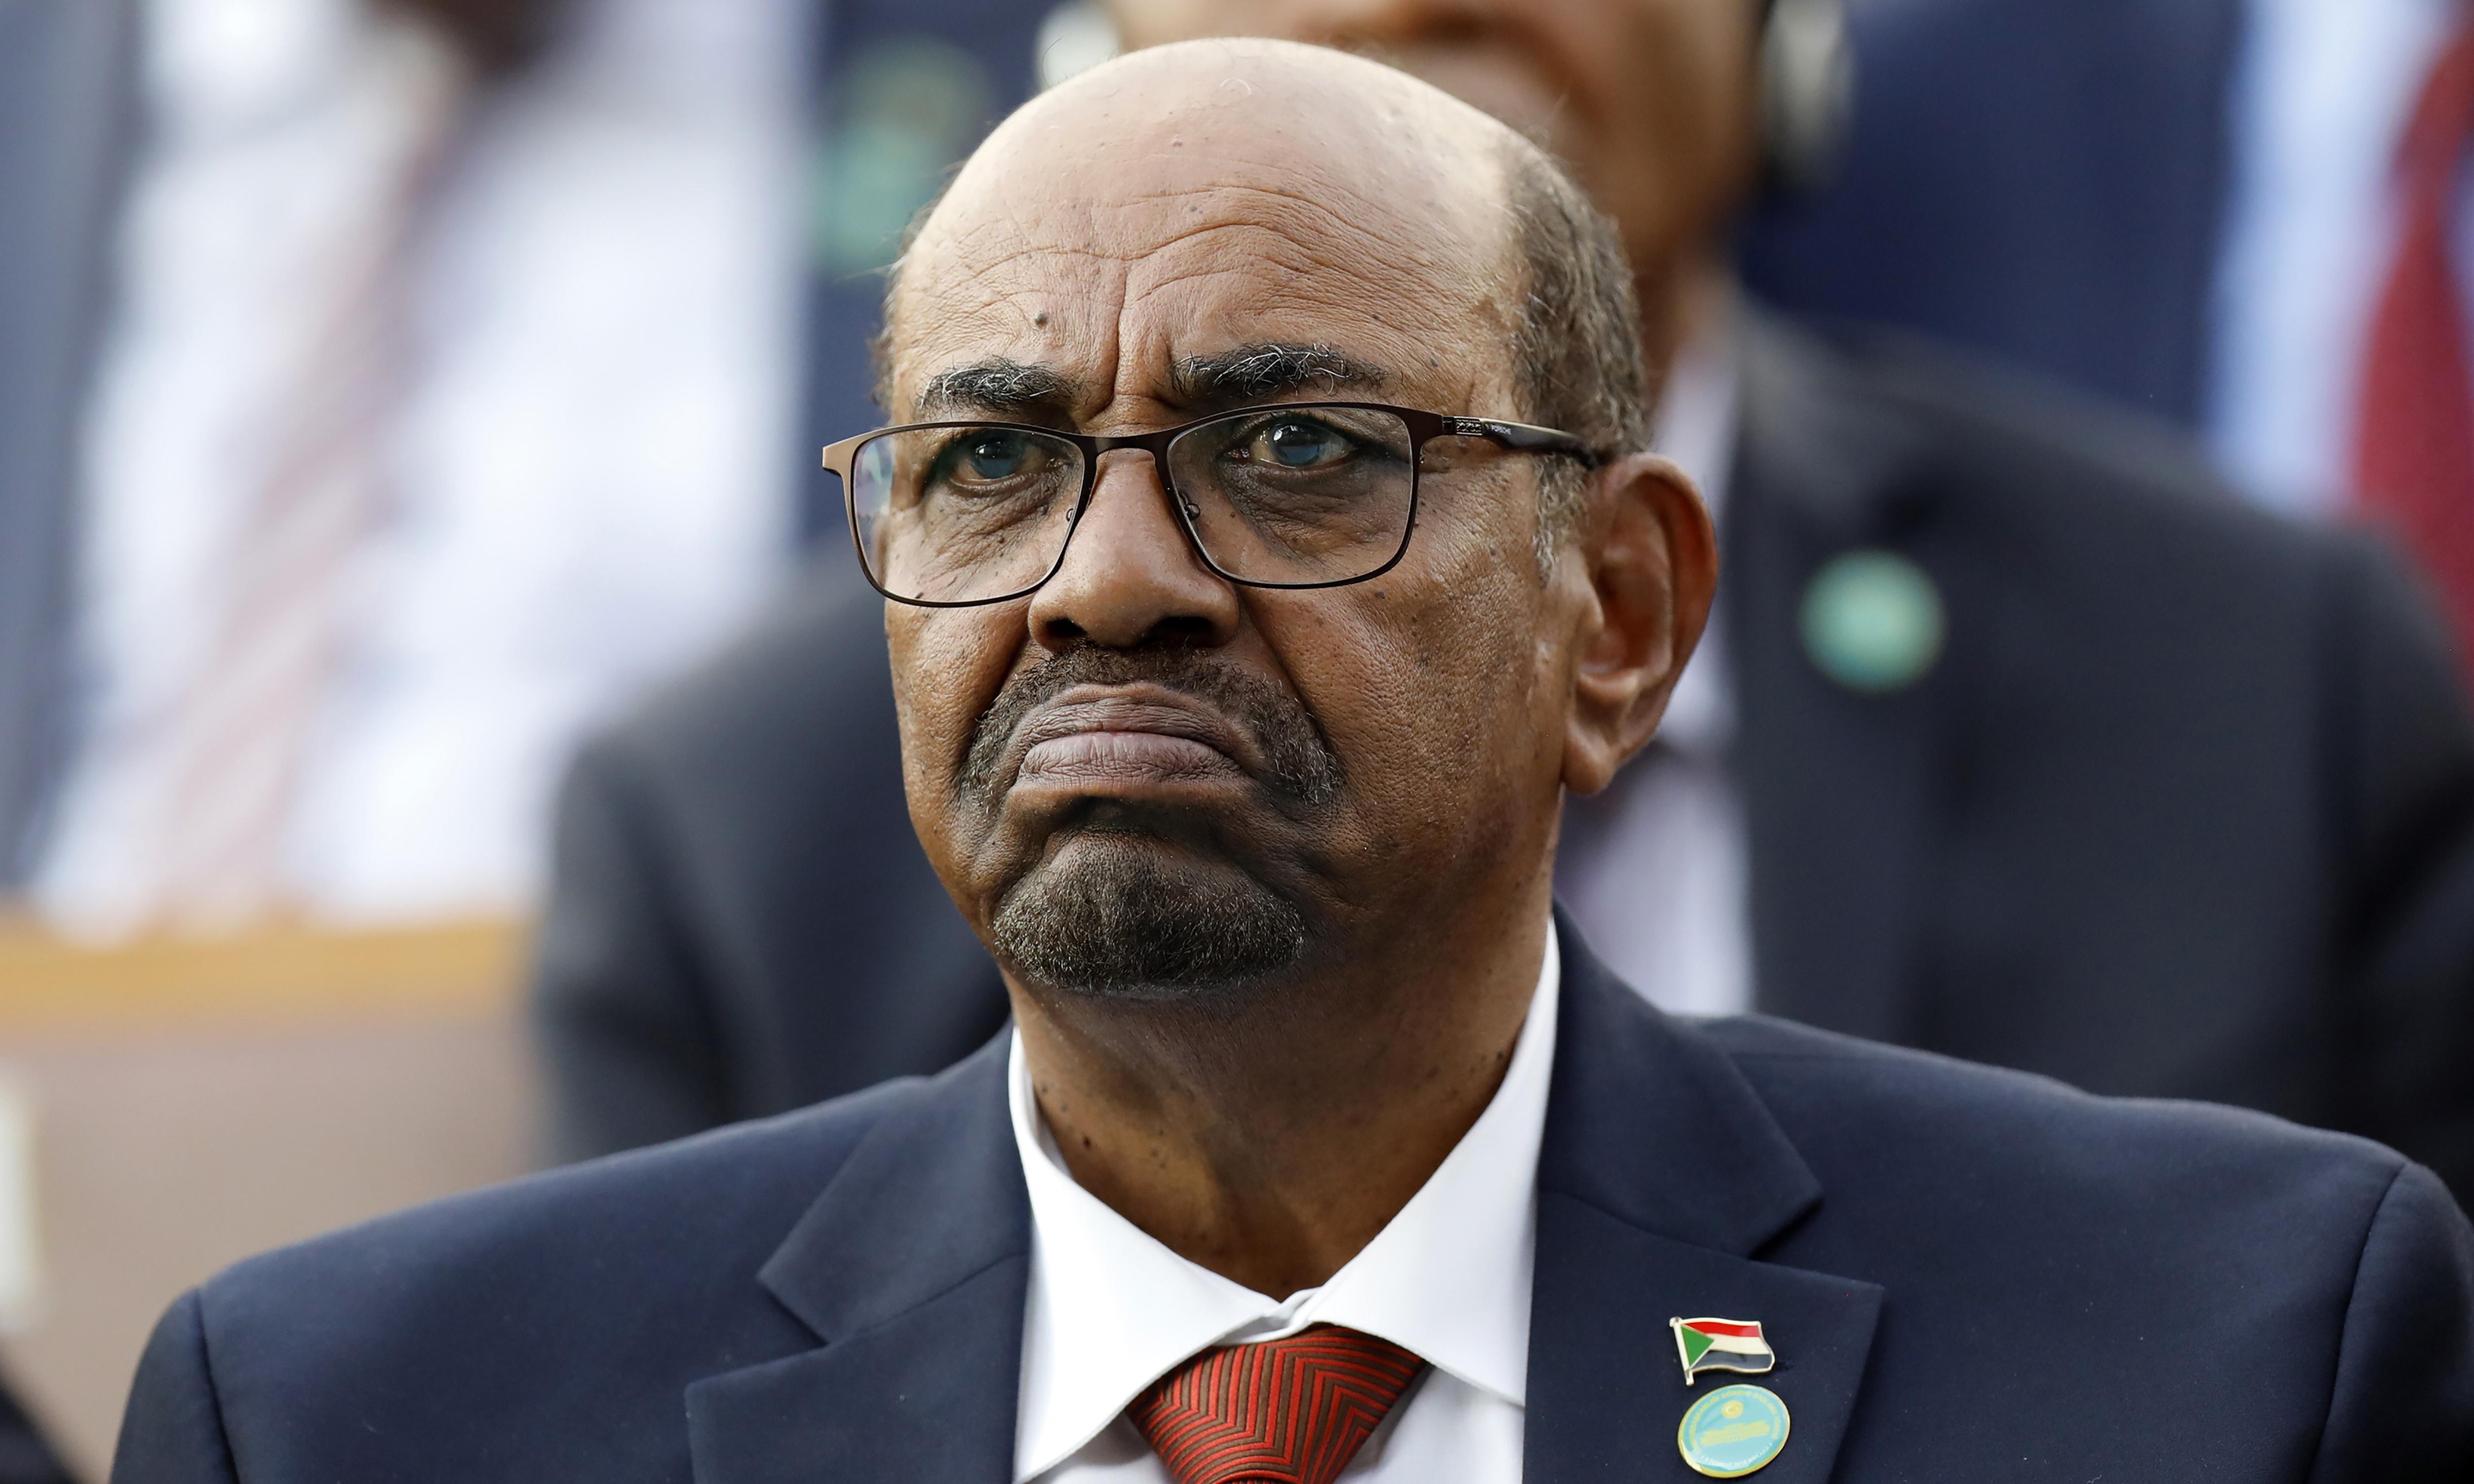 Sudan signals it may send former dictator Omar al-Bashir to ICC